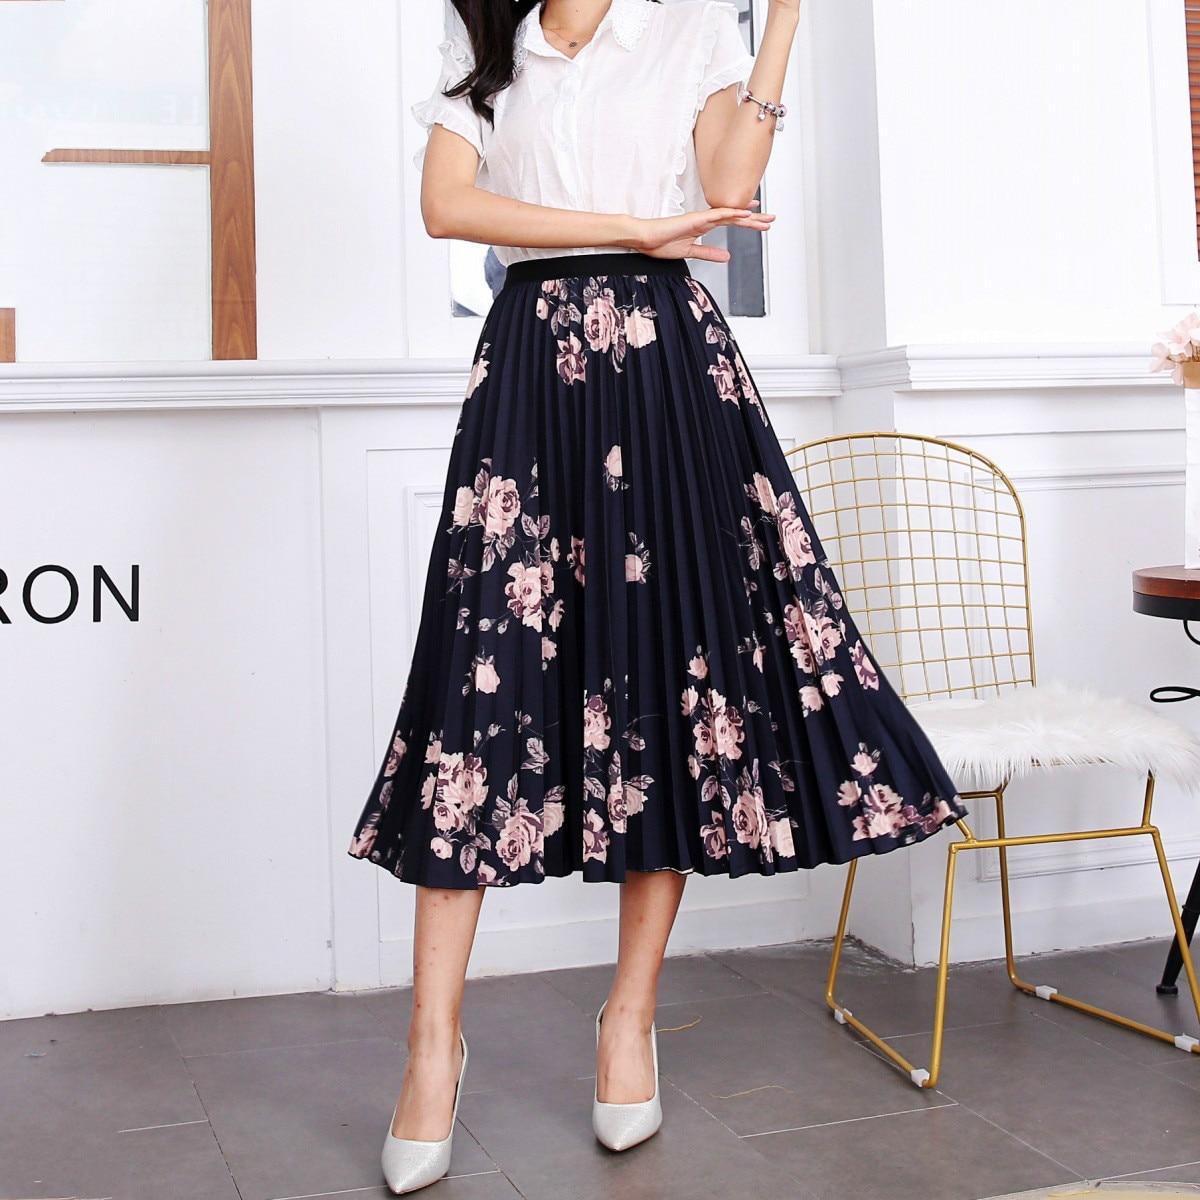 2020 New Summer Skirts Womens Butterfly Catroon Print Empire High Waist Elastci Pleated Midi Skirt European High Street Style 9